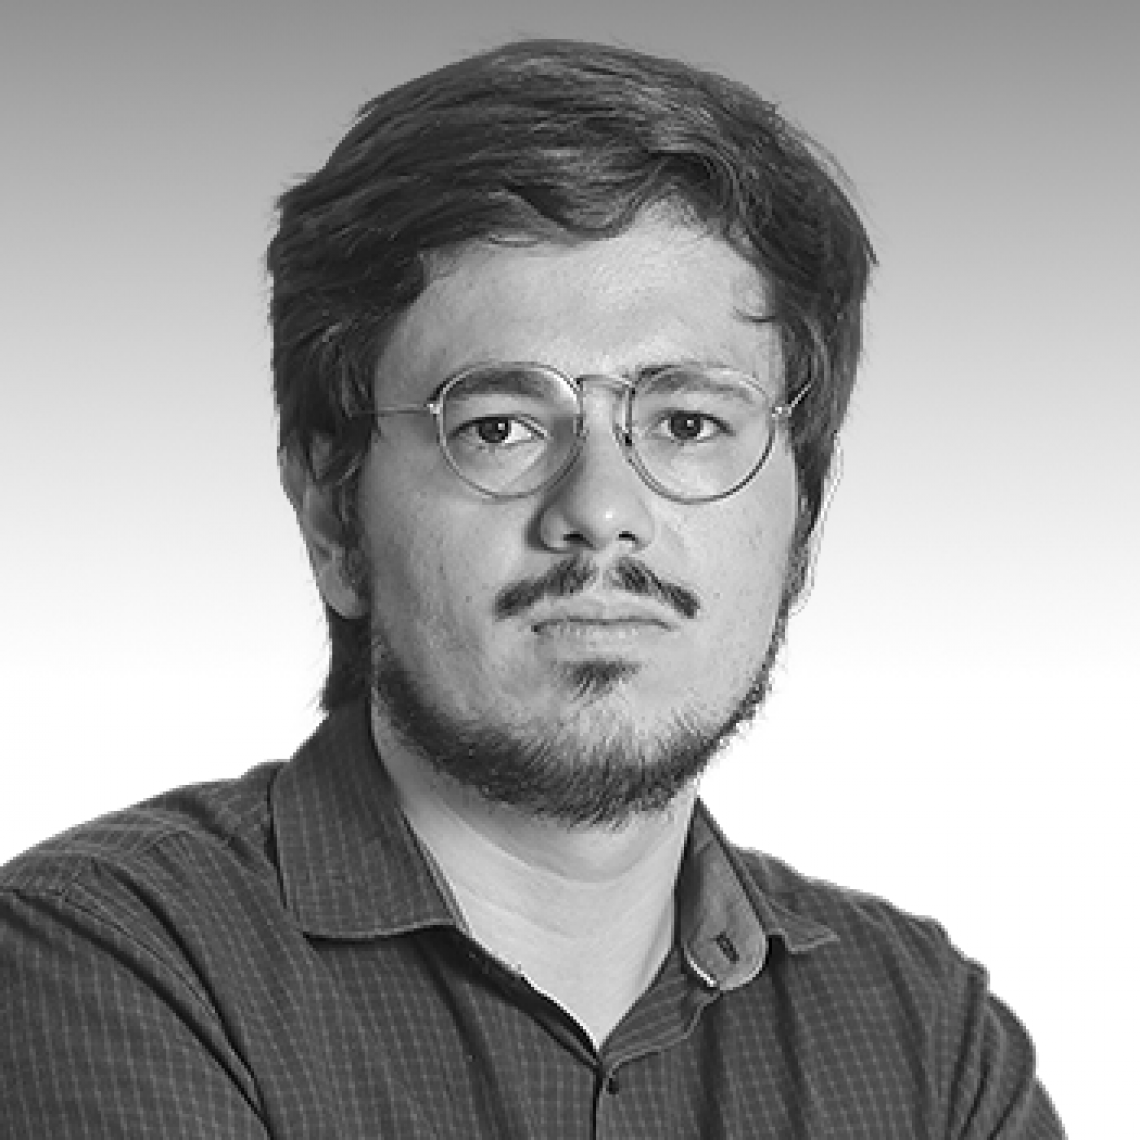 Carlos Mazza